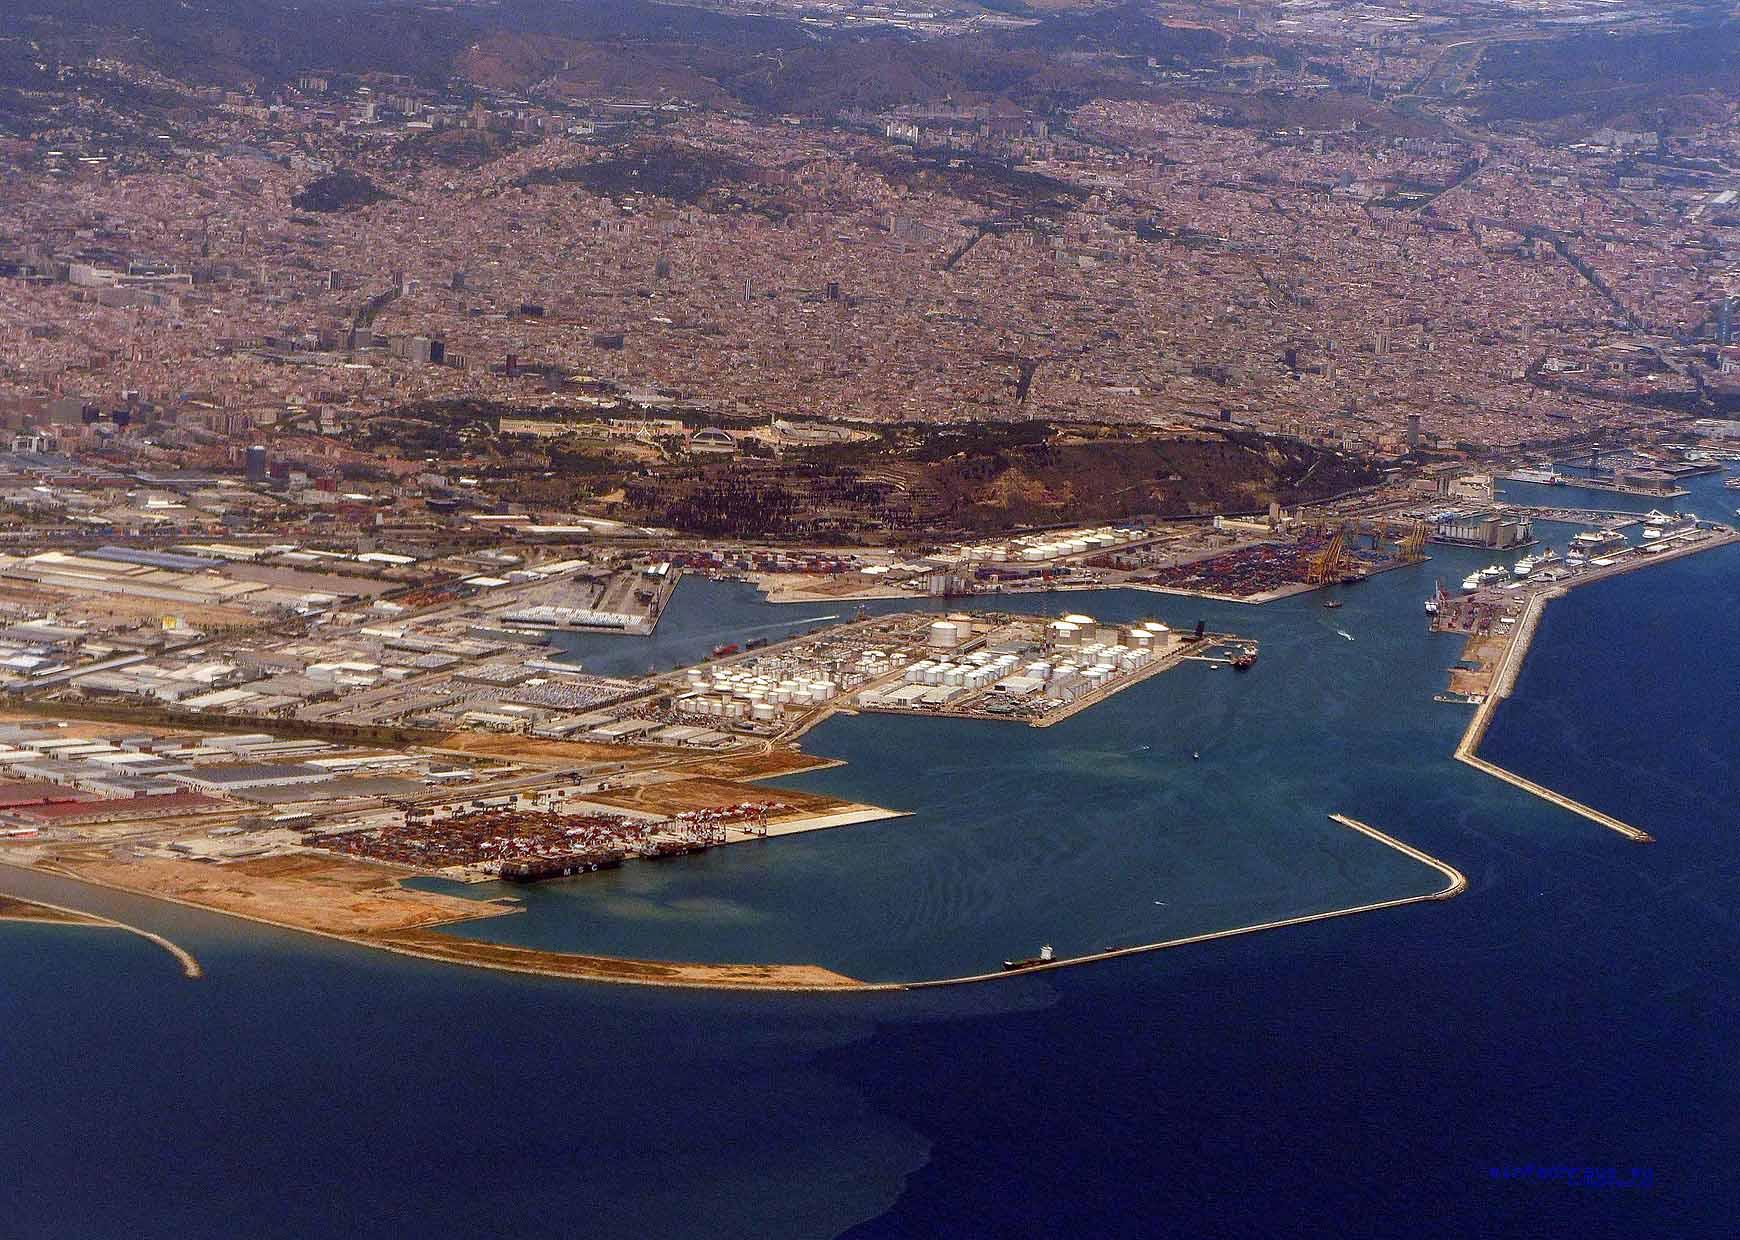 Anflug mit Vueling auf Barcelona